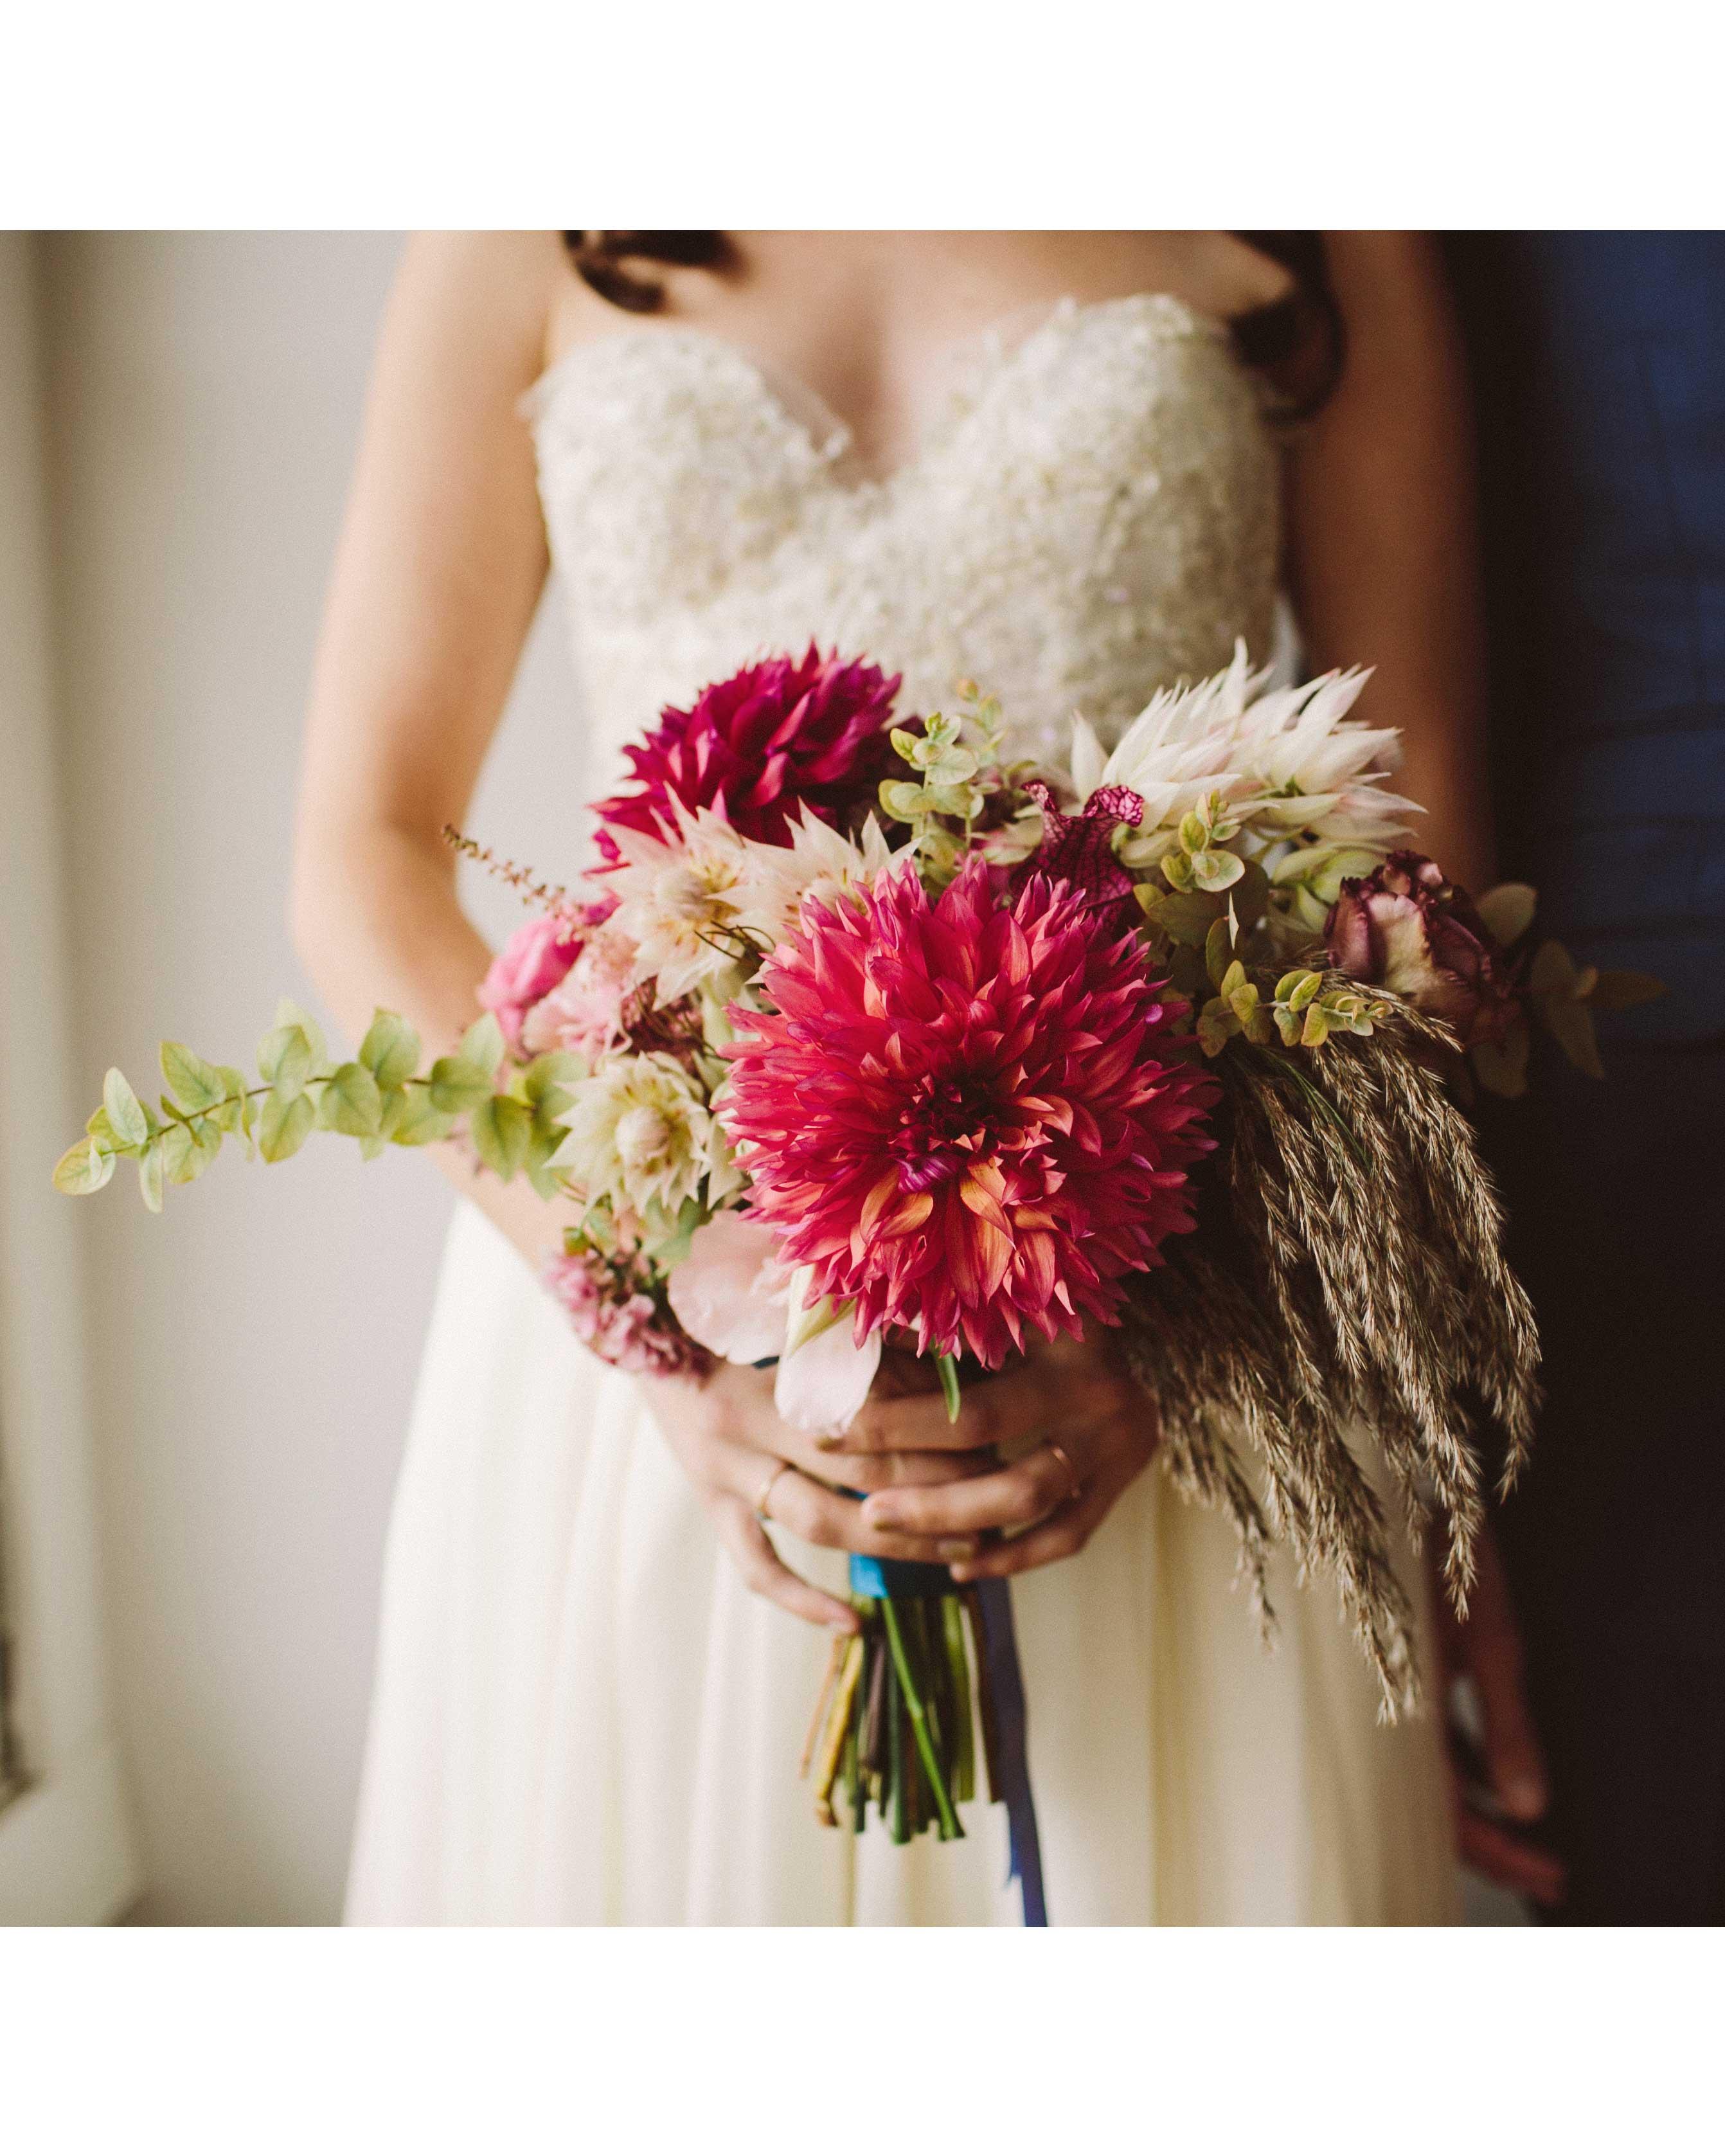 alisa-barrett-wedding-bouquet-183-s113048-0716.jpg